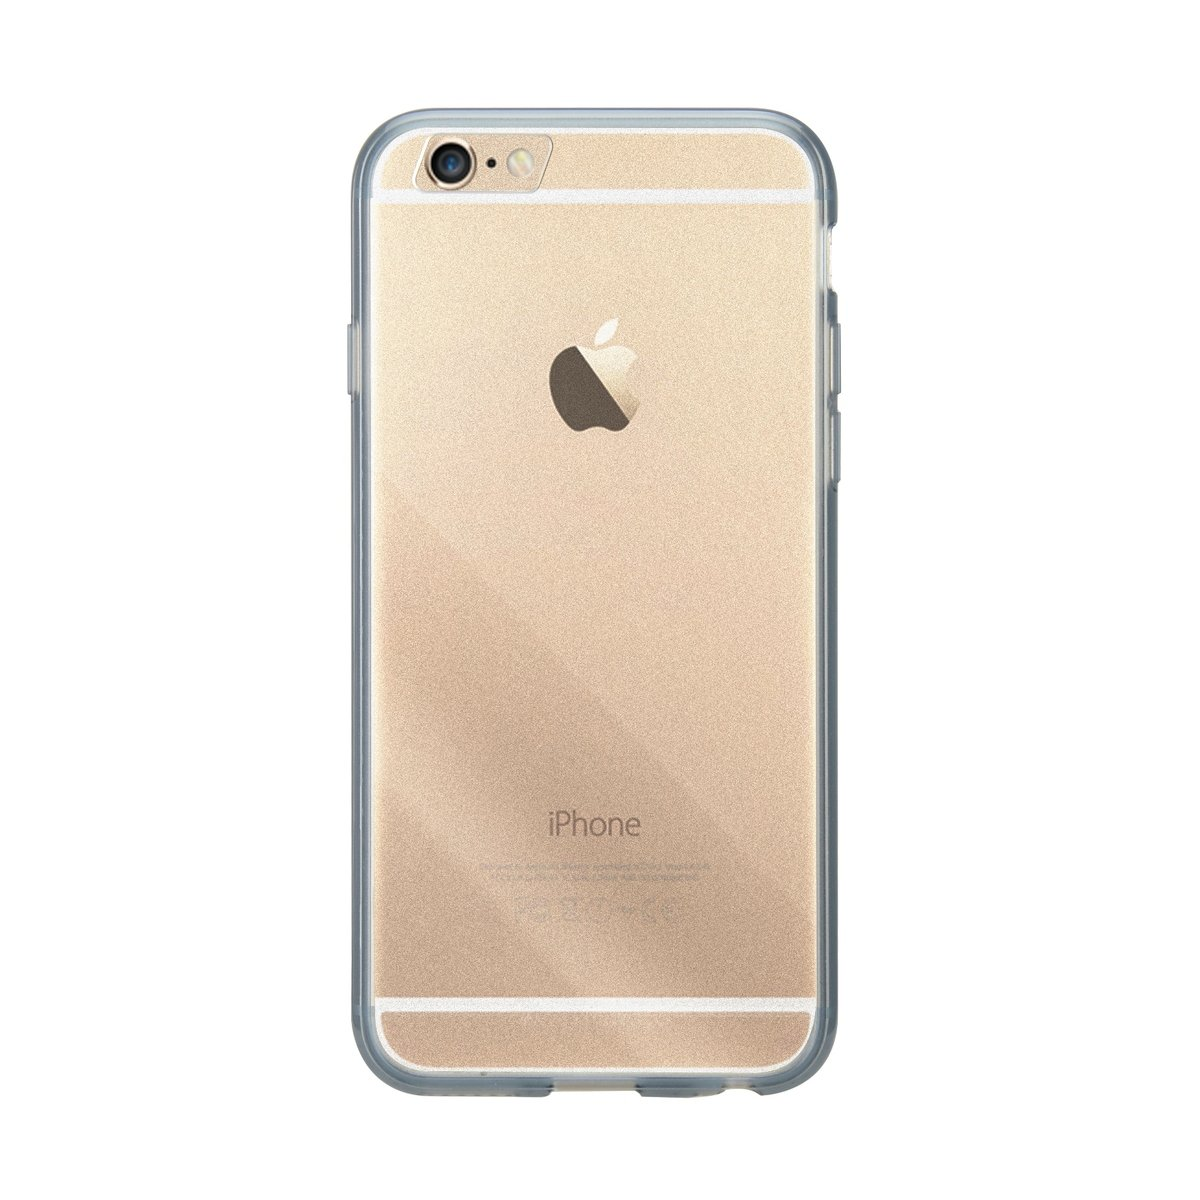 "iPhone 6 Plus/6S Plus (5.5"") PolyUltima手機保護殼 - 透明黑色(附送屏幕保護貼)"